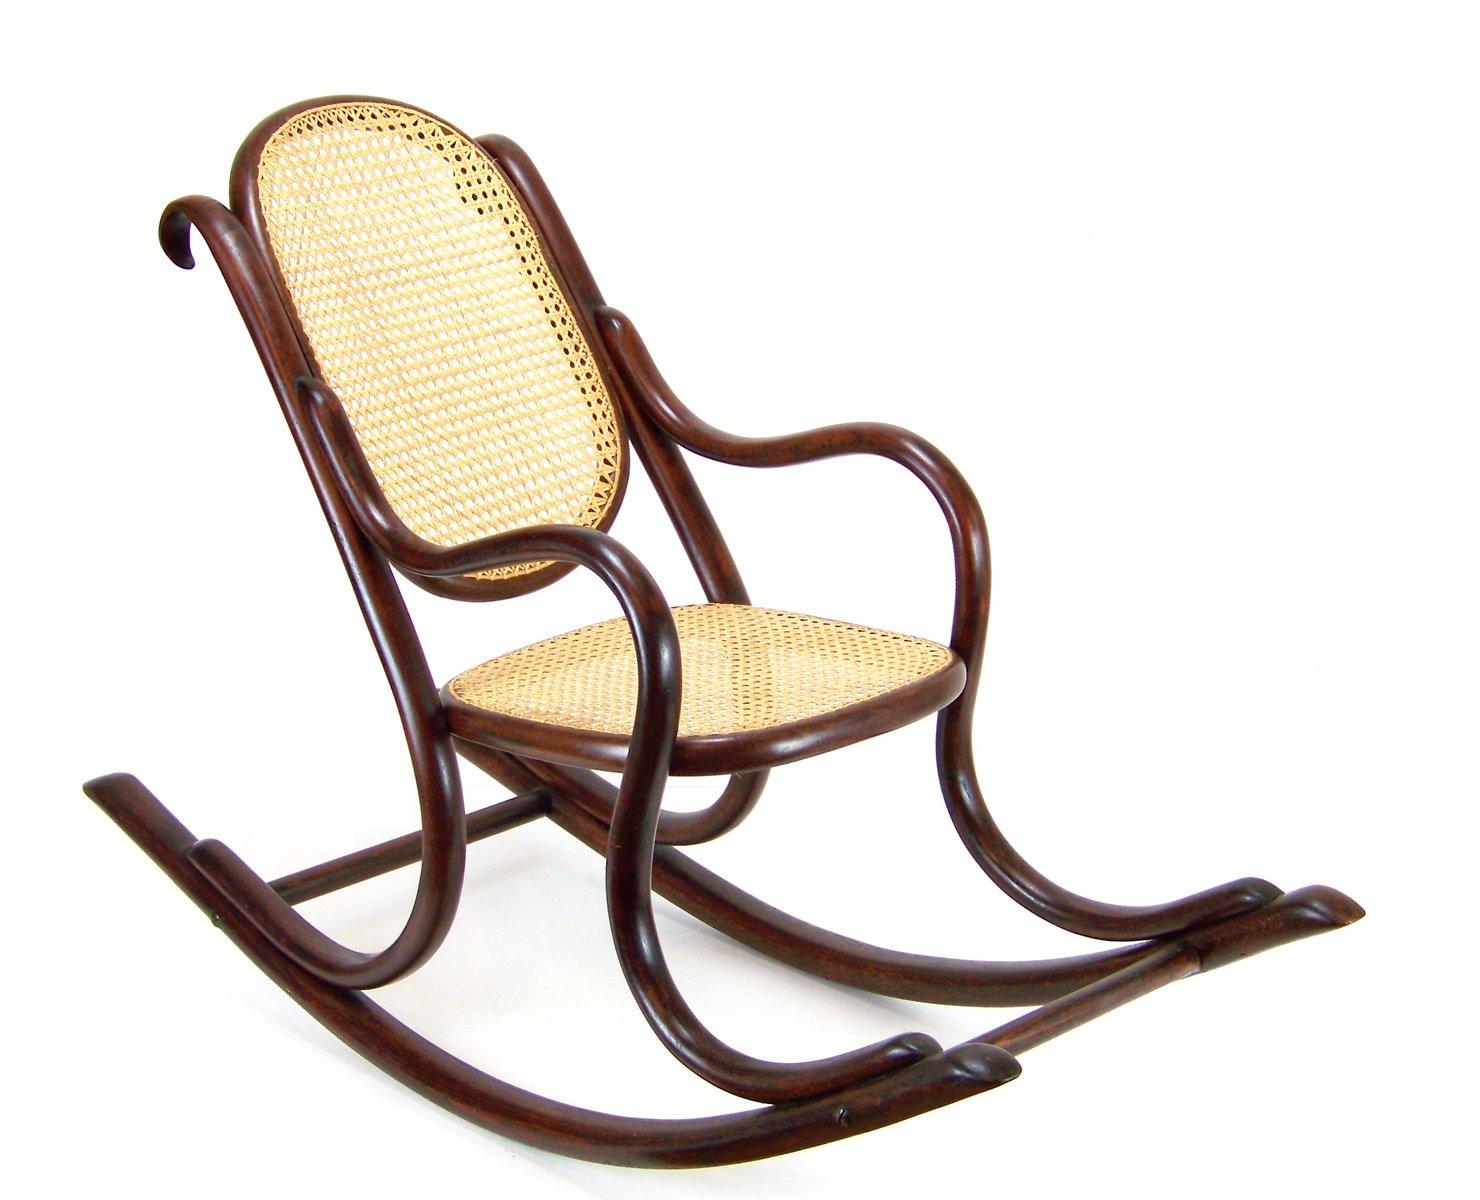 Outdoor Schaukelstuhl children s number 2 rocking chair from fischel 1890s for sale at pamono